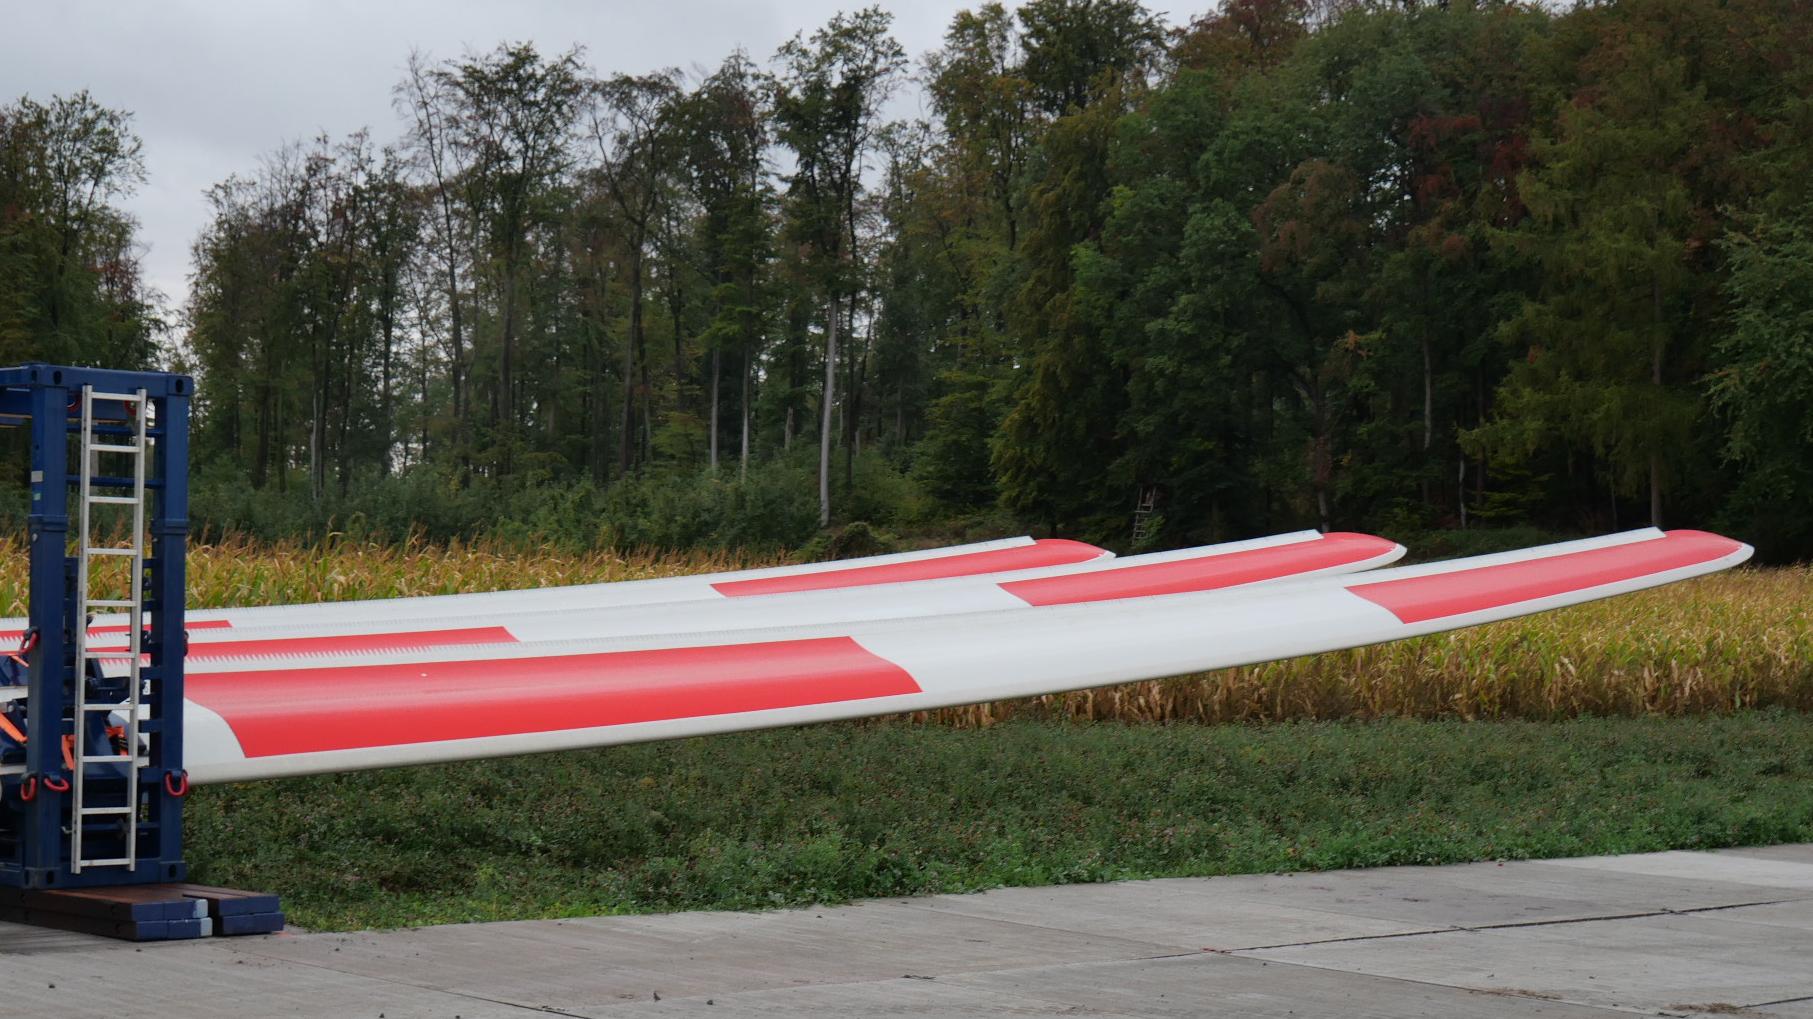 Windkraft im Bau in Ober-Ramstadt